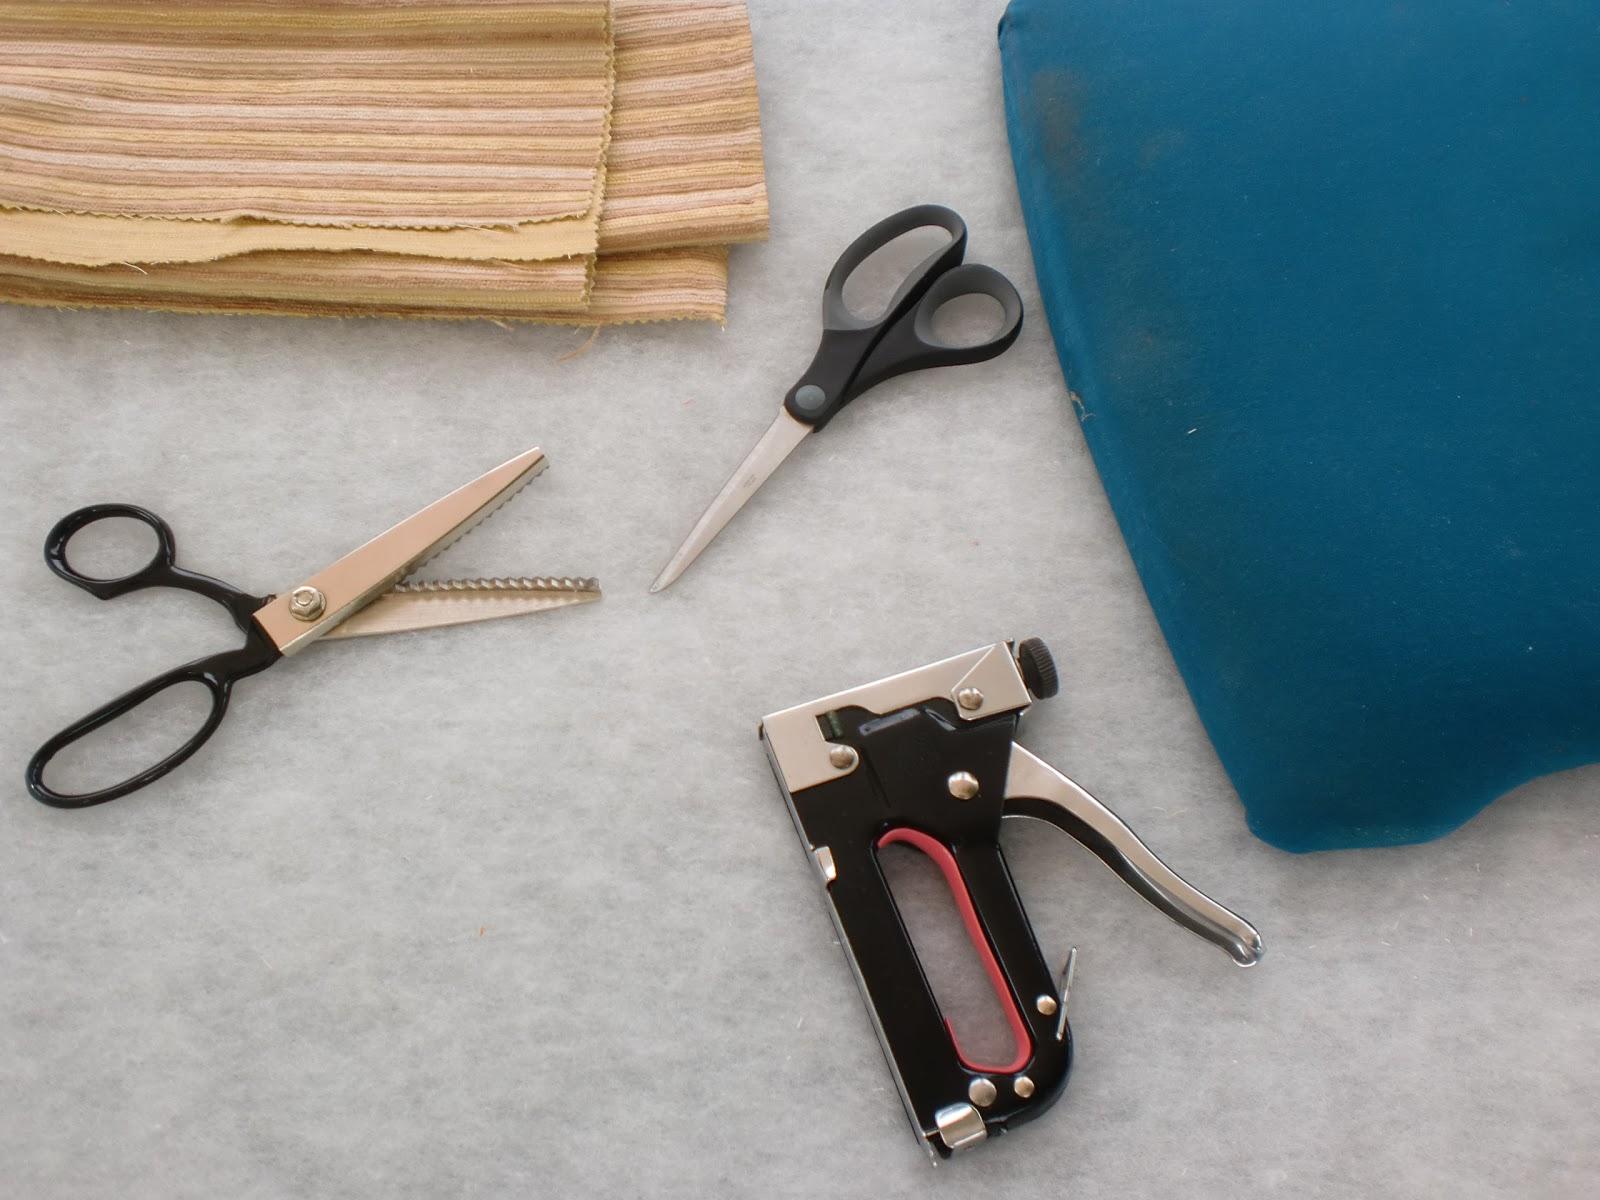 Cambiar la tapicer a de las silla bricolaje - Telas tapiceria sillas ...